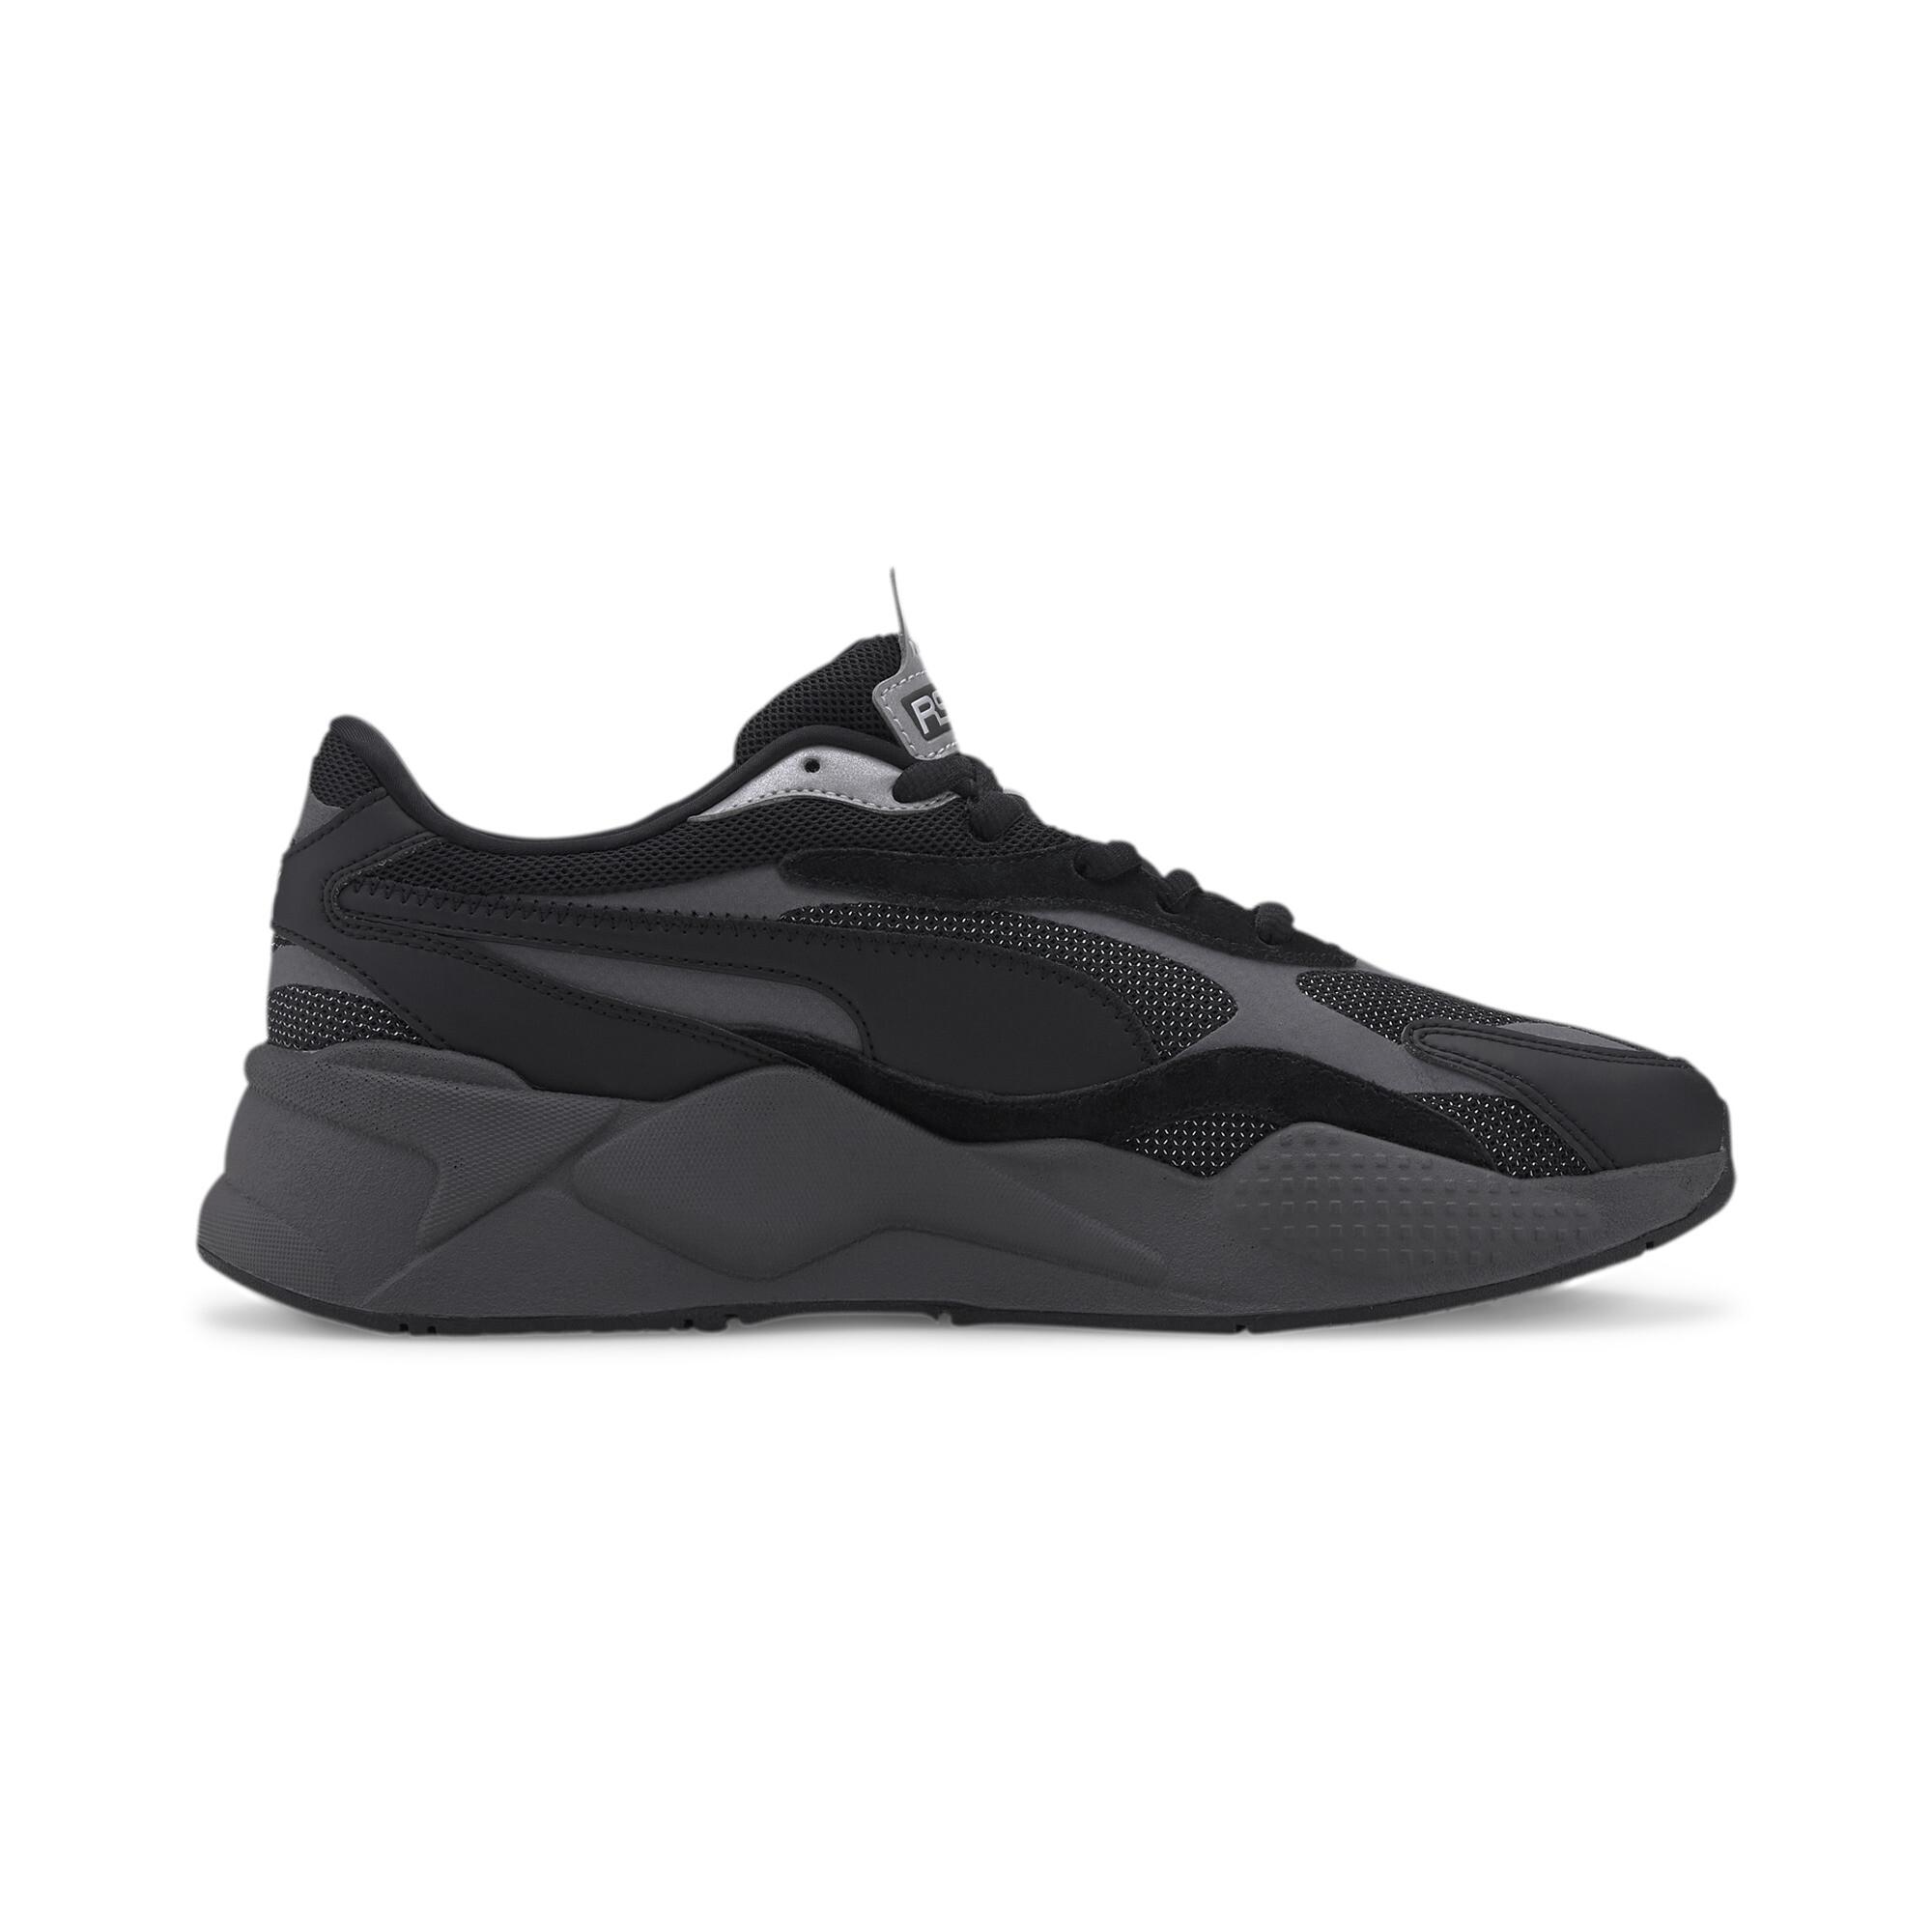 PUMA-Men-039-s-RS-X-Puzzle-Sneakers thumbnail 26